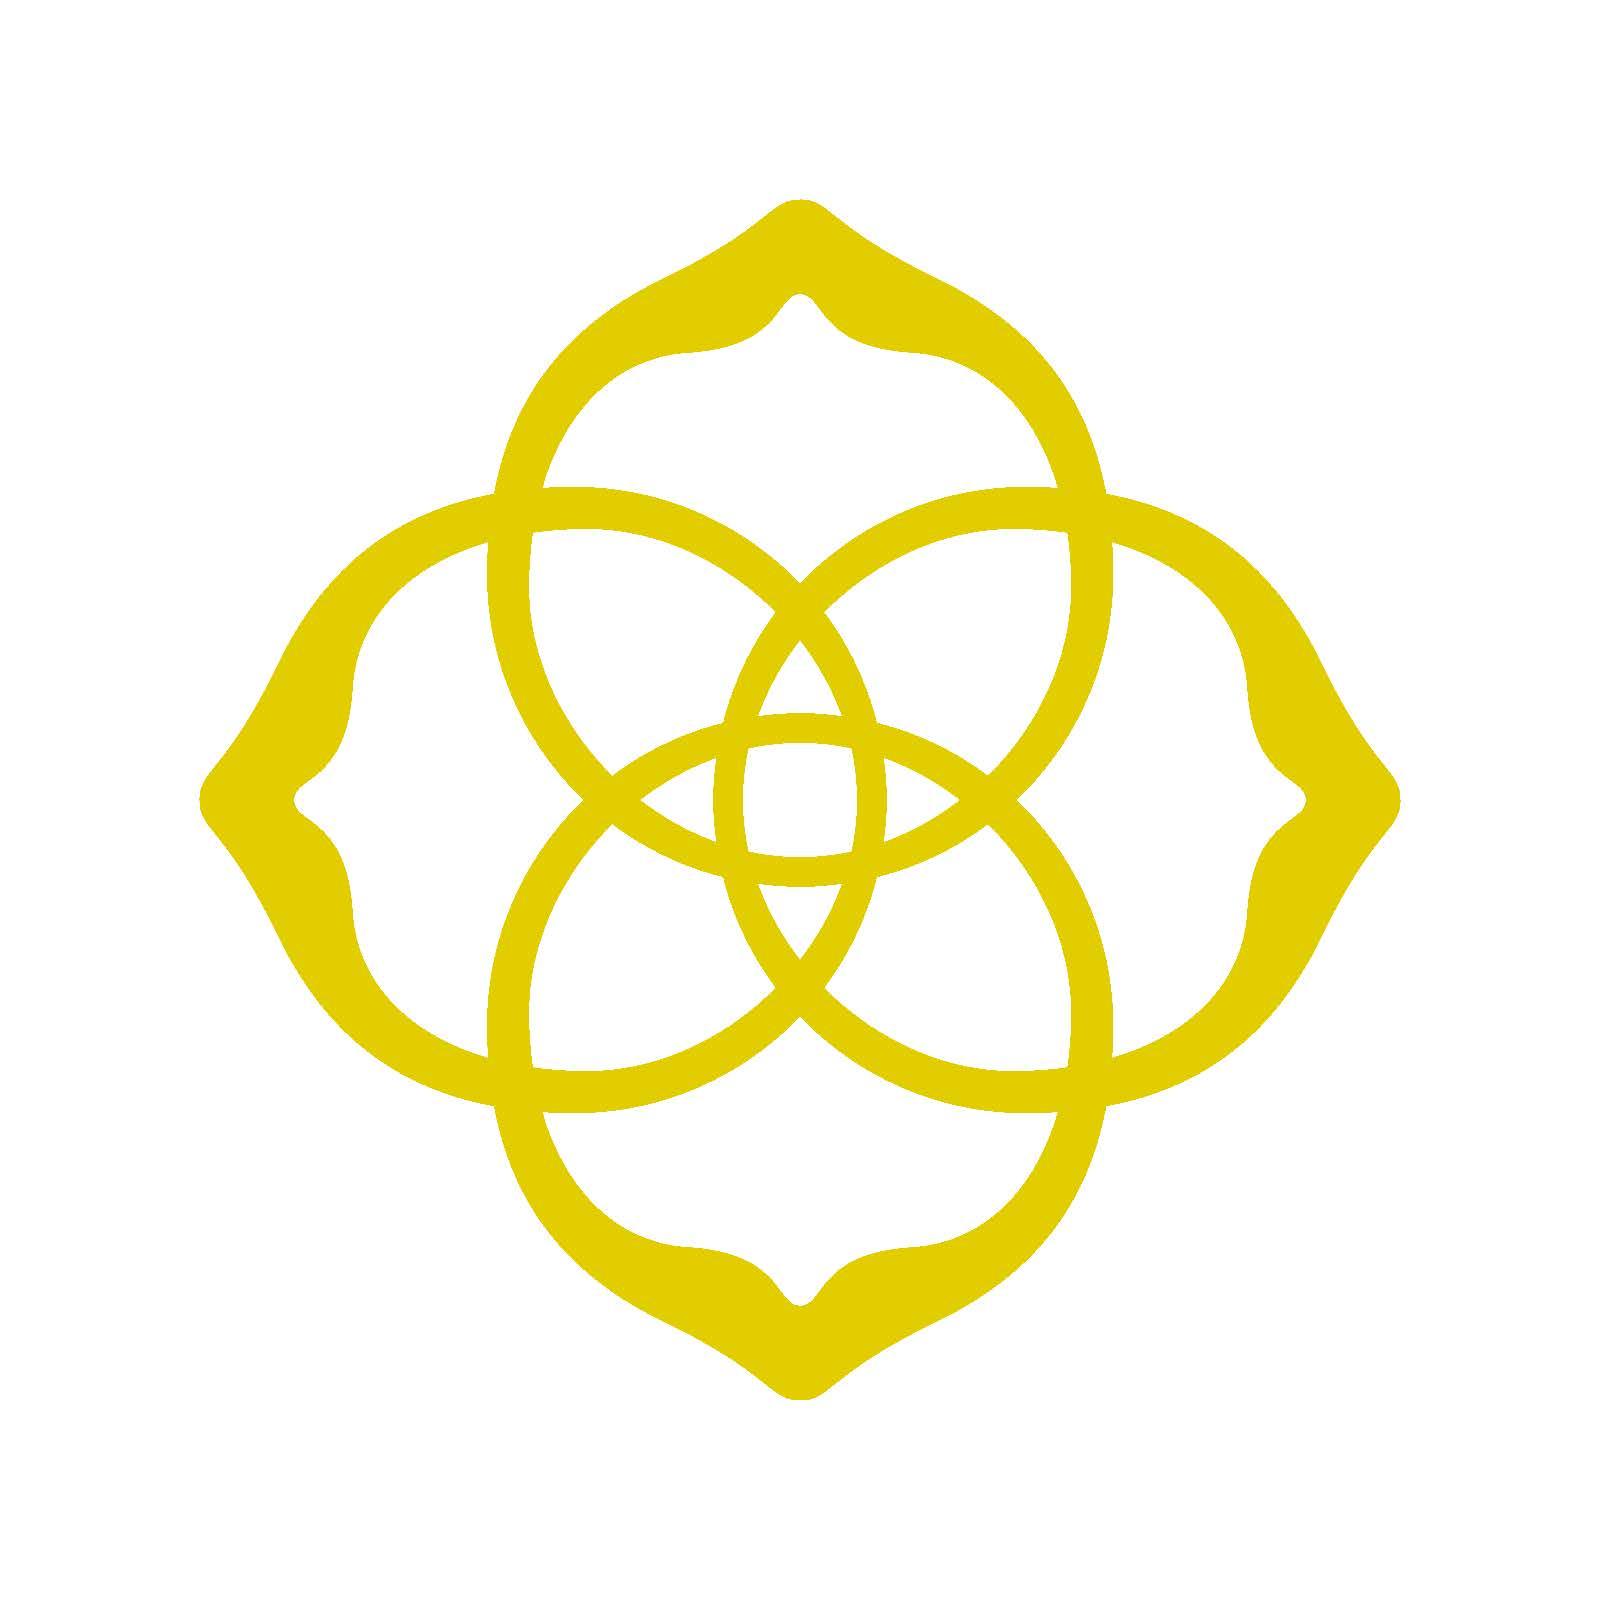 Kendra Scott-2016-Medallion-PMS-605-Logo